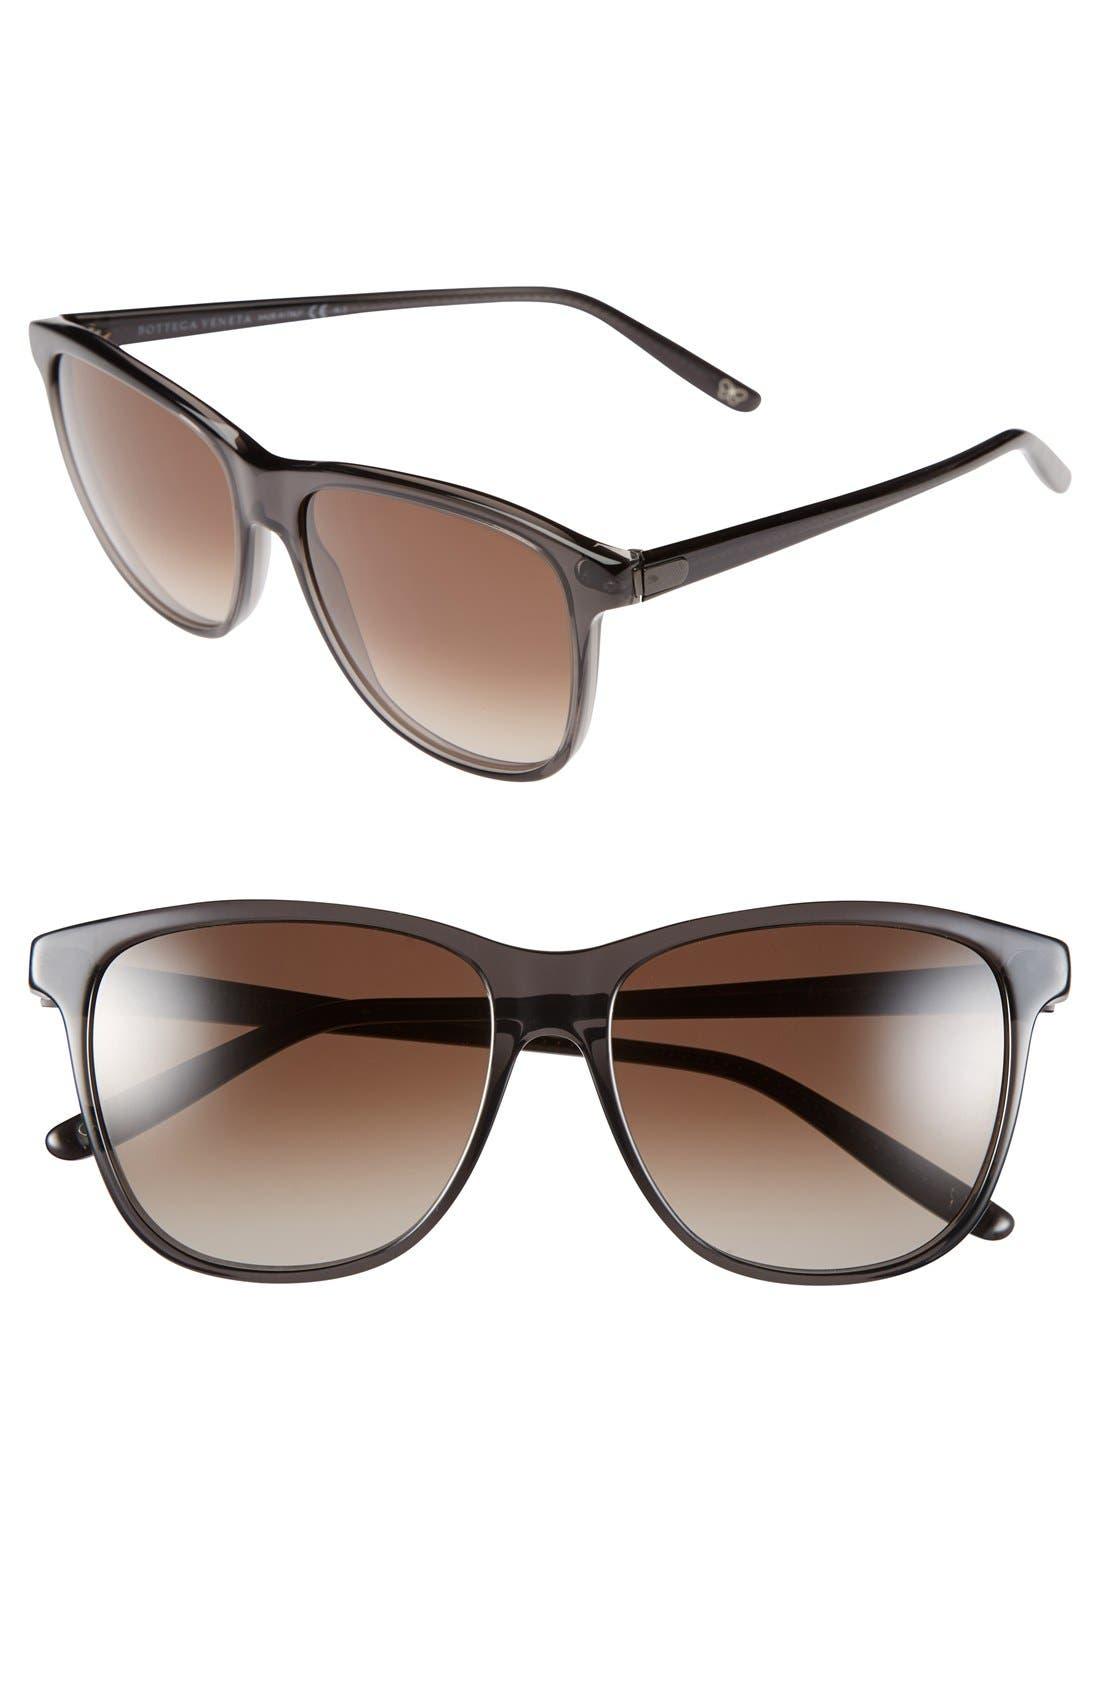 Main Image - Bottega Veneta 56mm Sunglasses